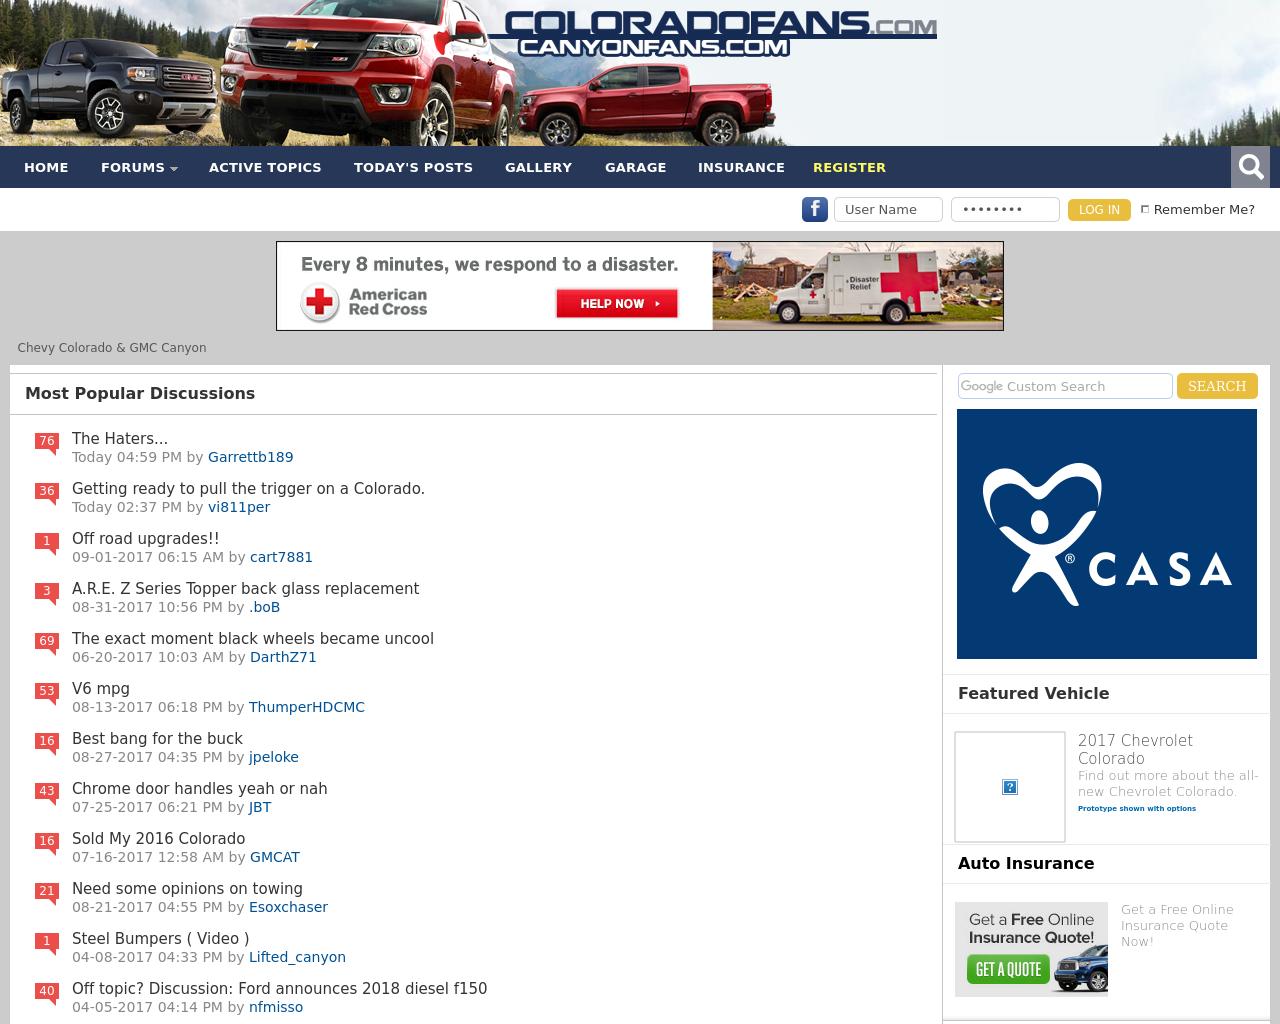 Coloradofans.com-Advertising-Reviews-Pricing